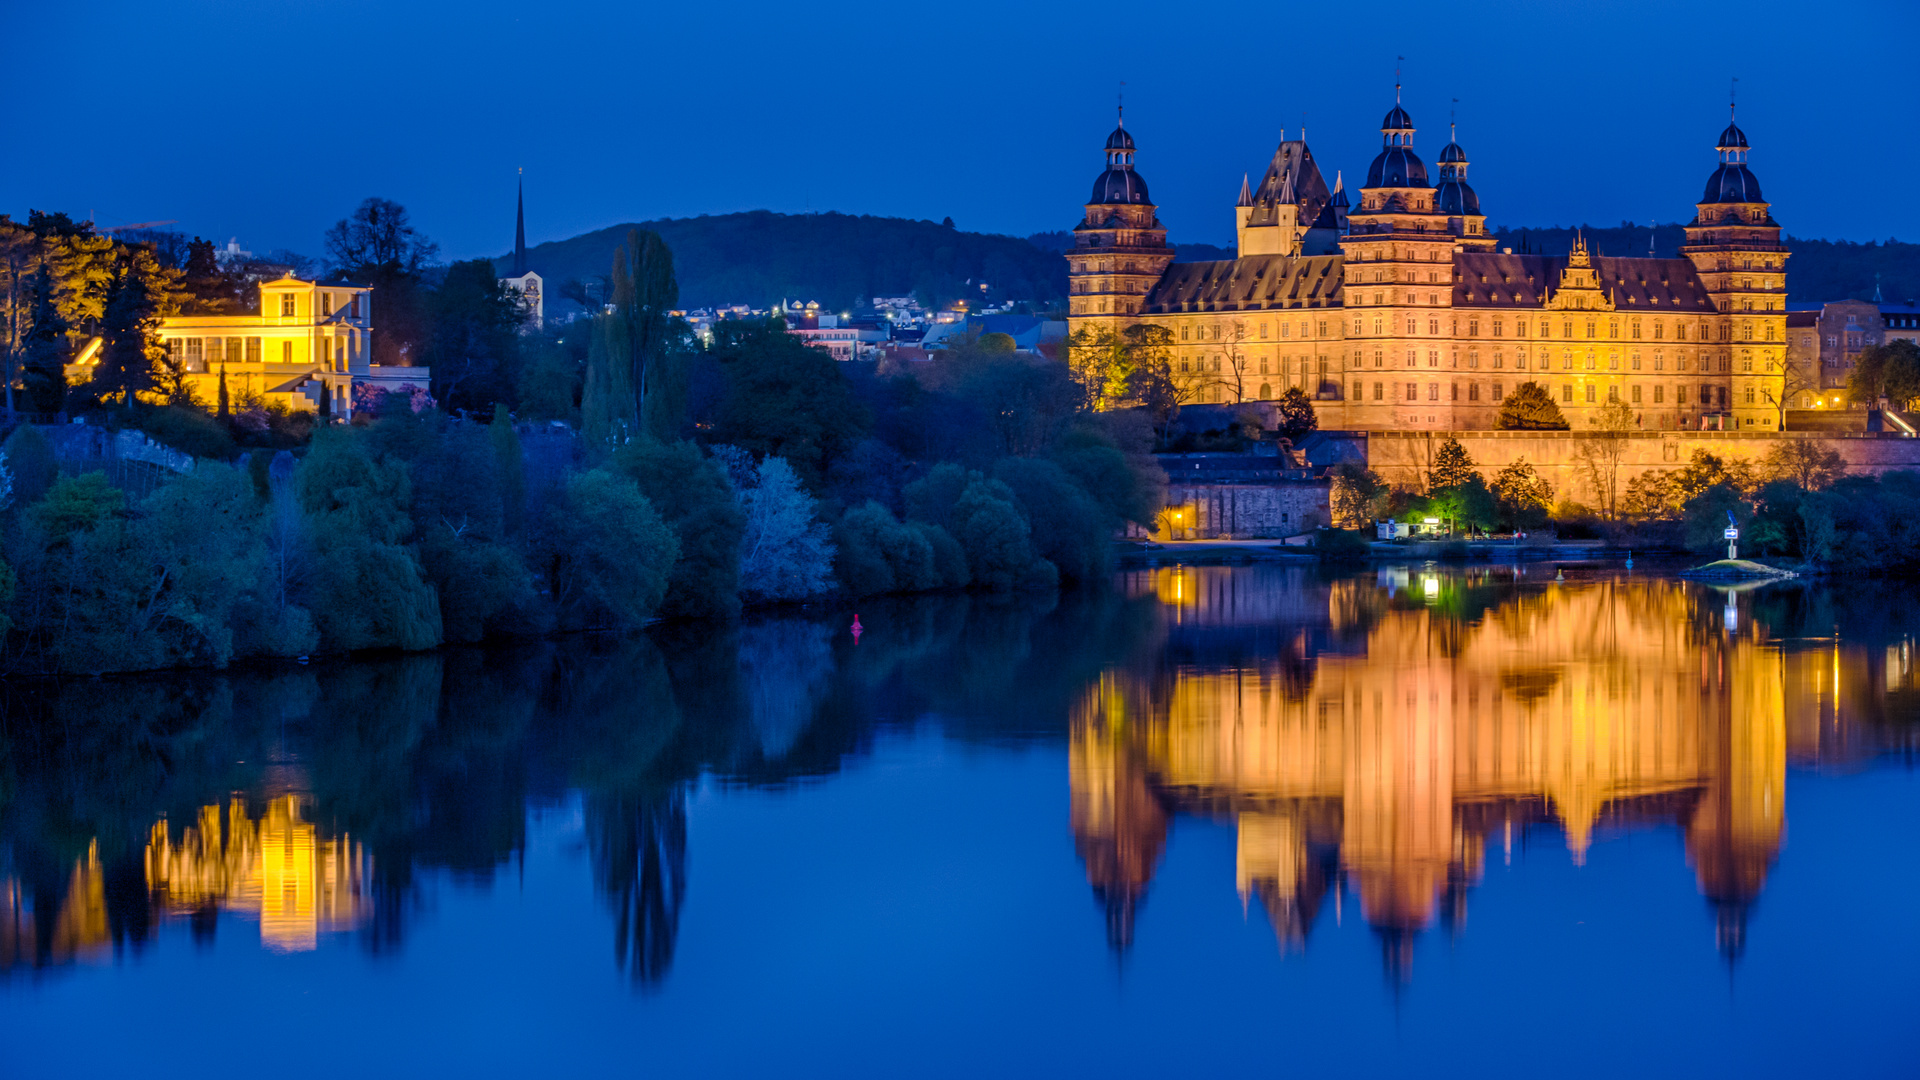 Blaue Stunde Schloss Aschaffenburg